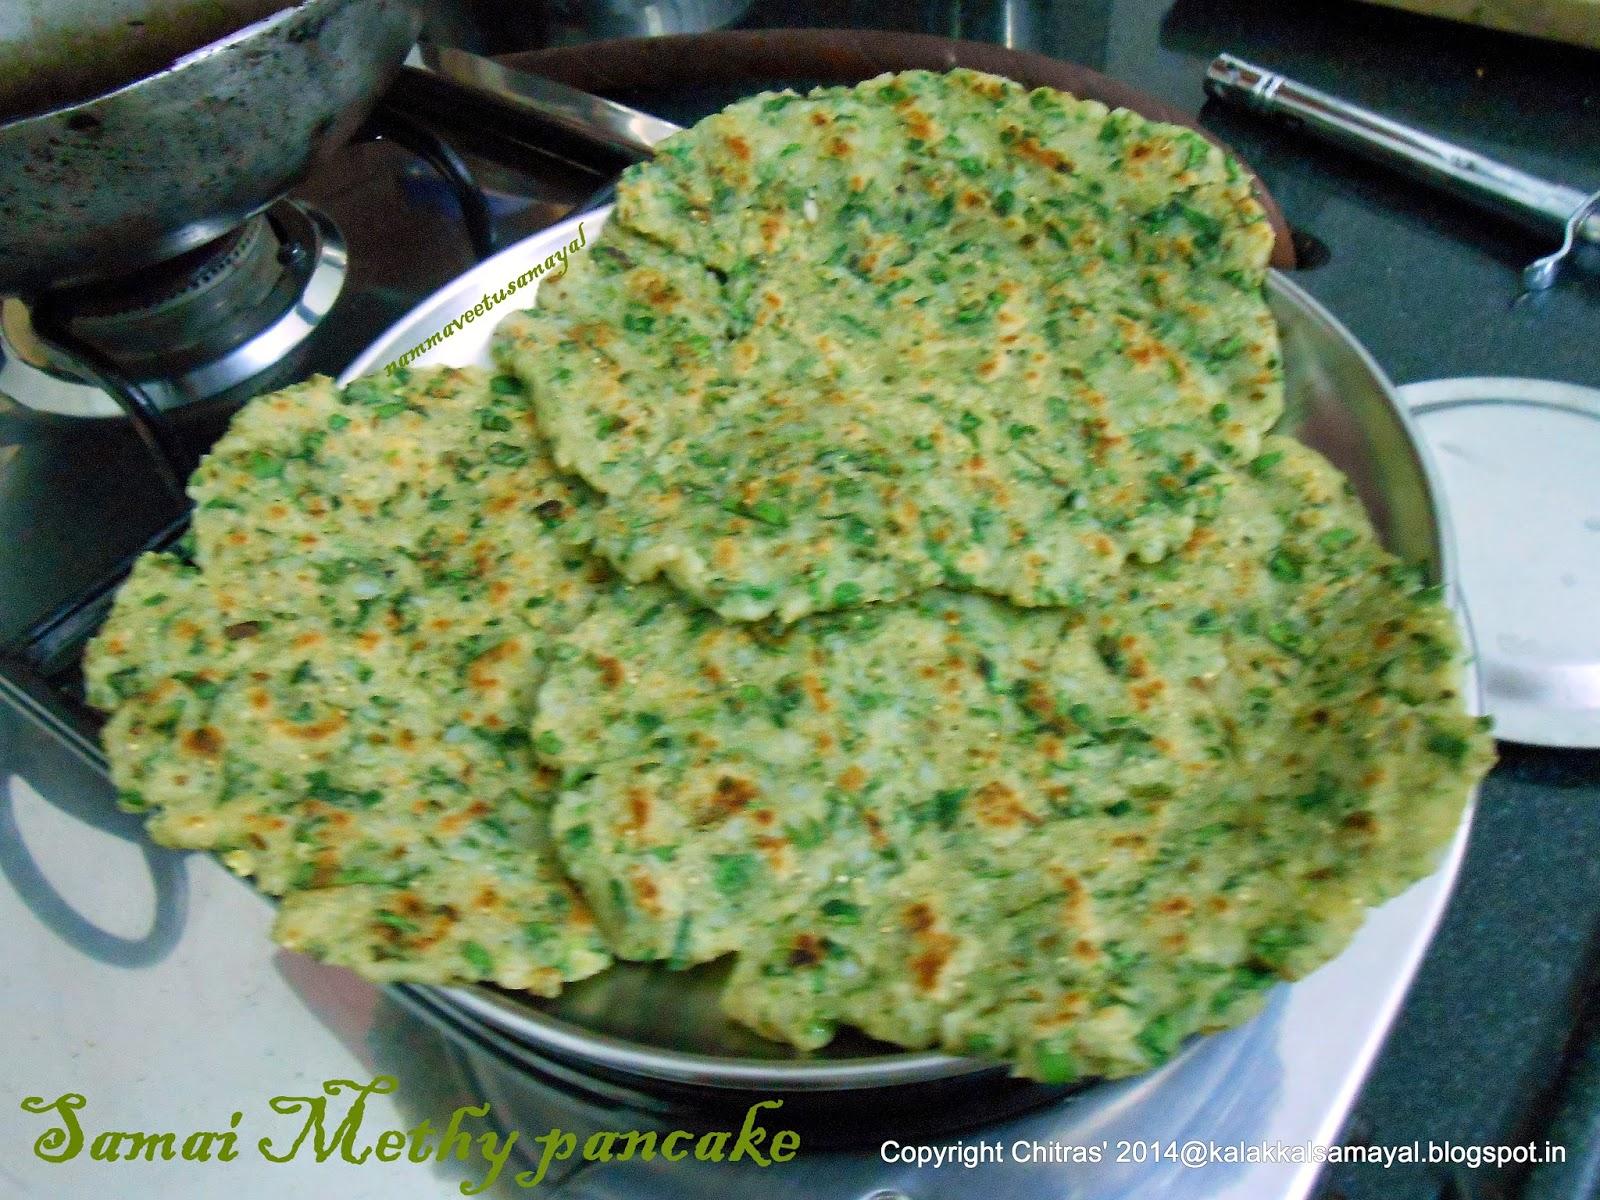 Samai Methy Pancake [ Littlemillet Fenugreek leaf pancake ]